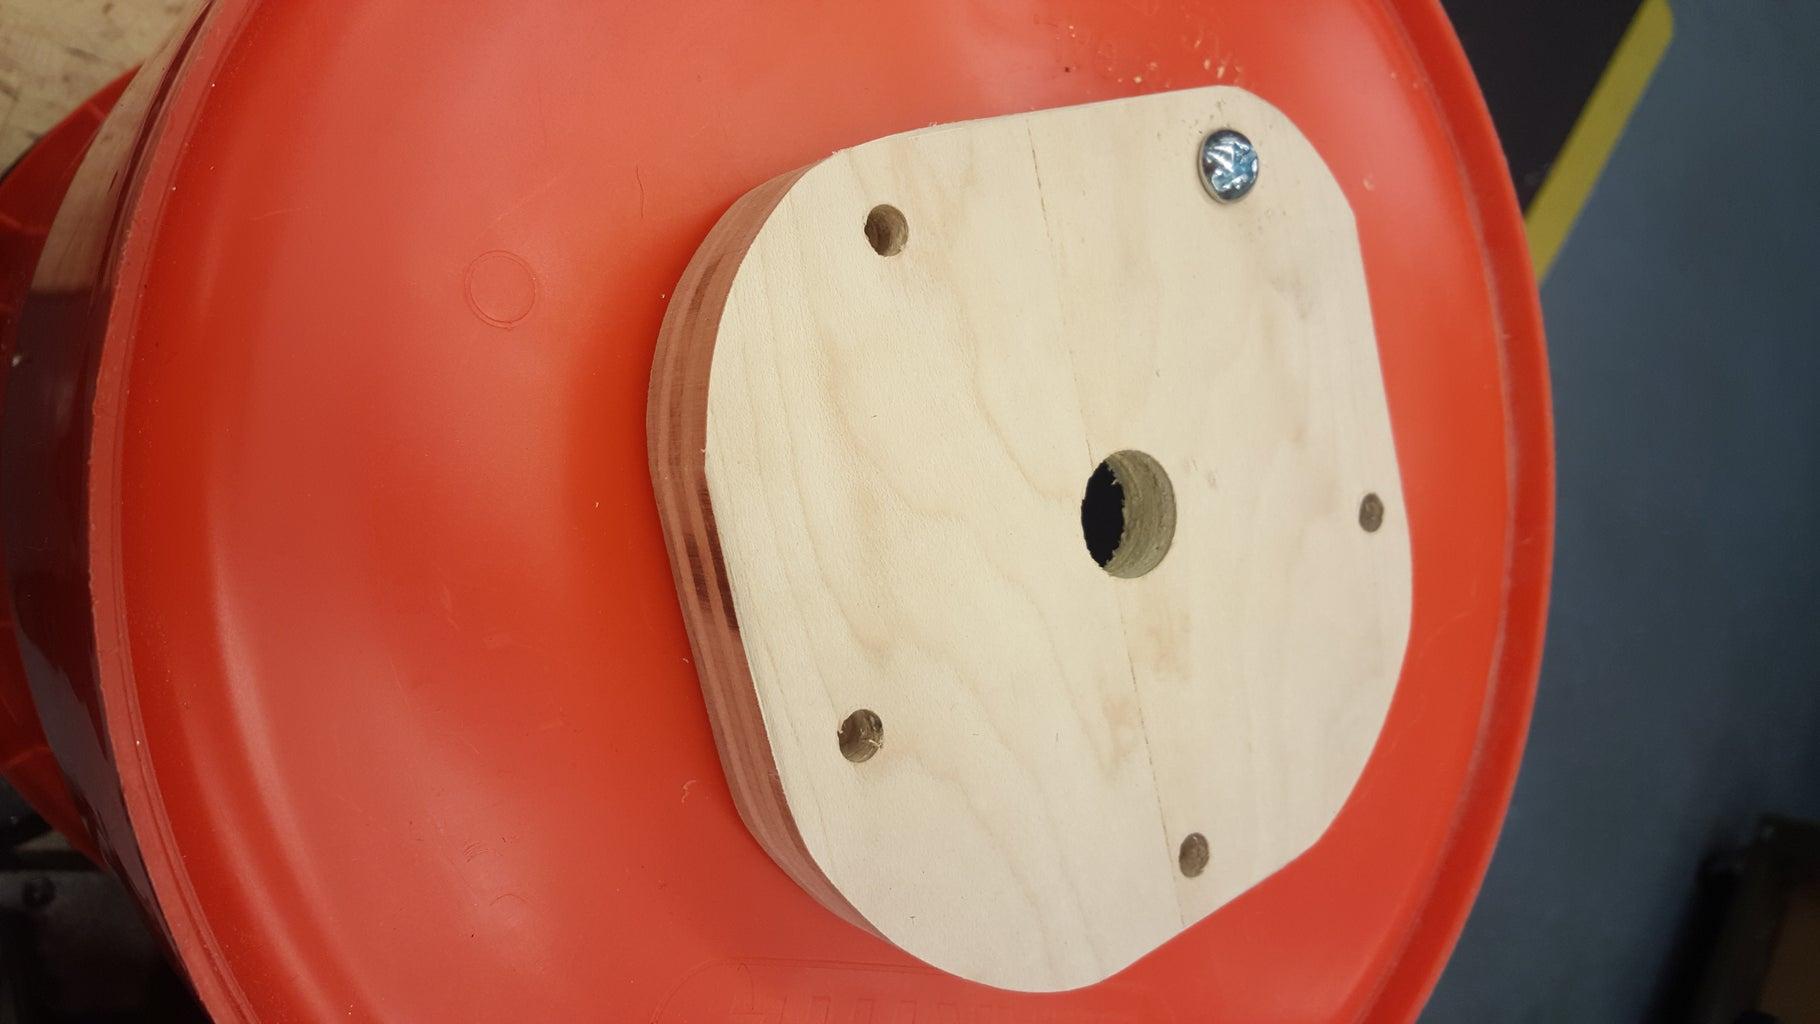 Drill the Bucket: Sprocket Mount Holes